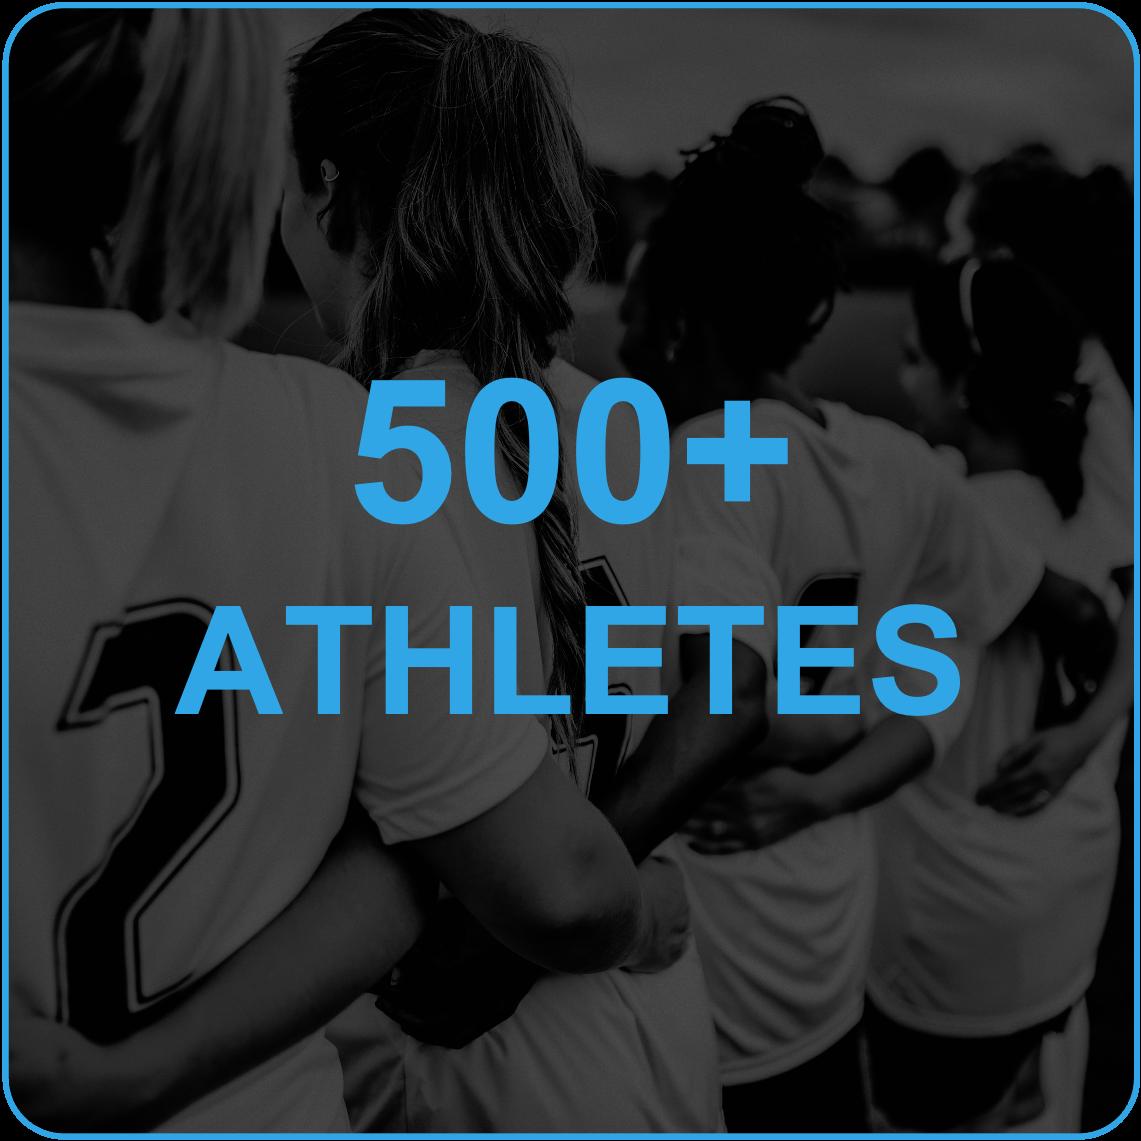 500 athletes